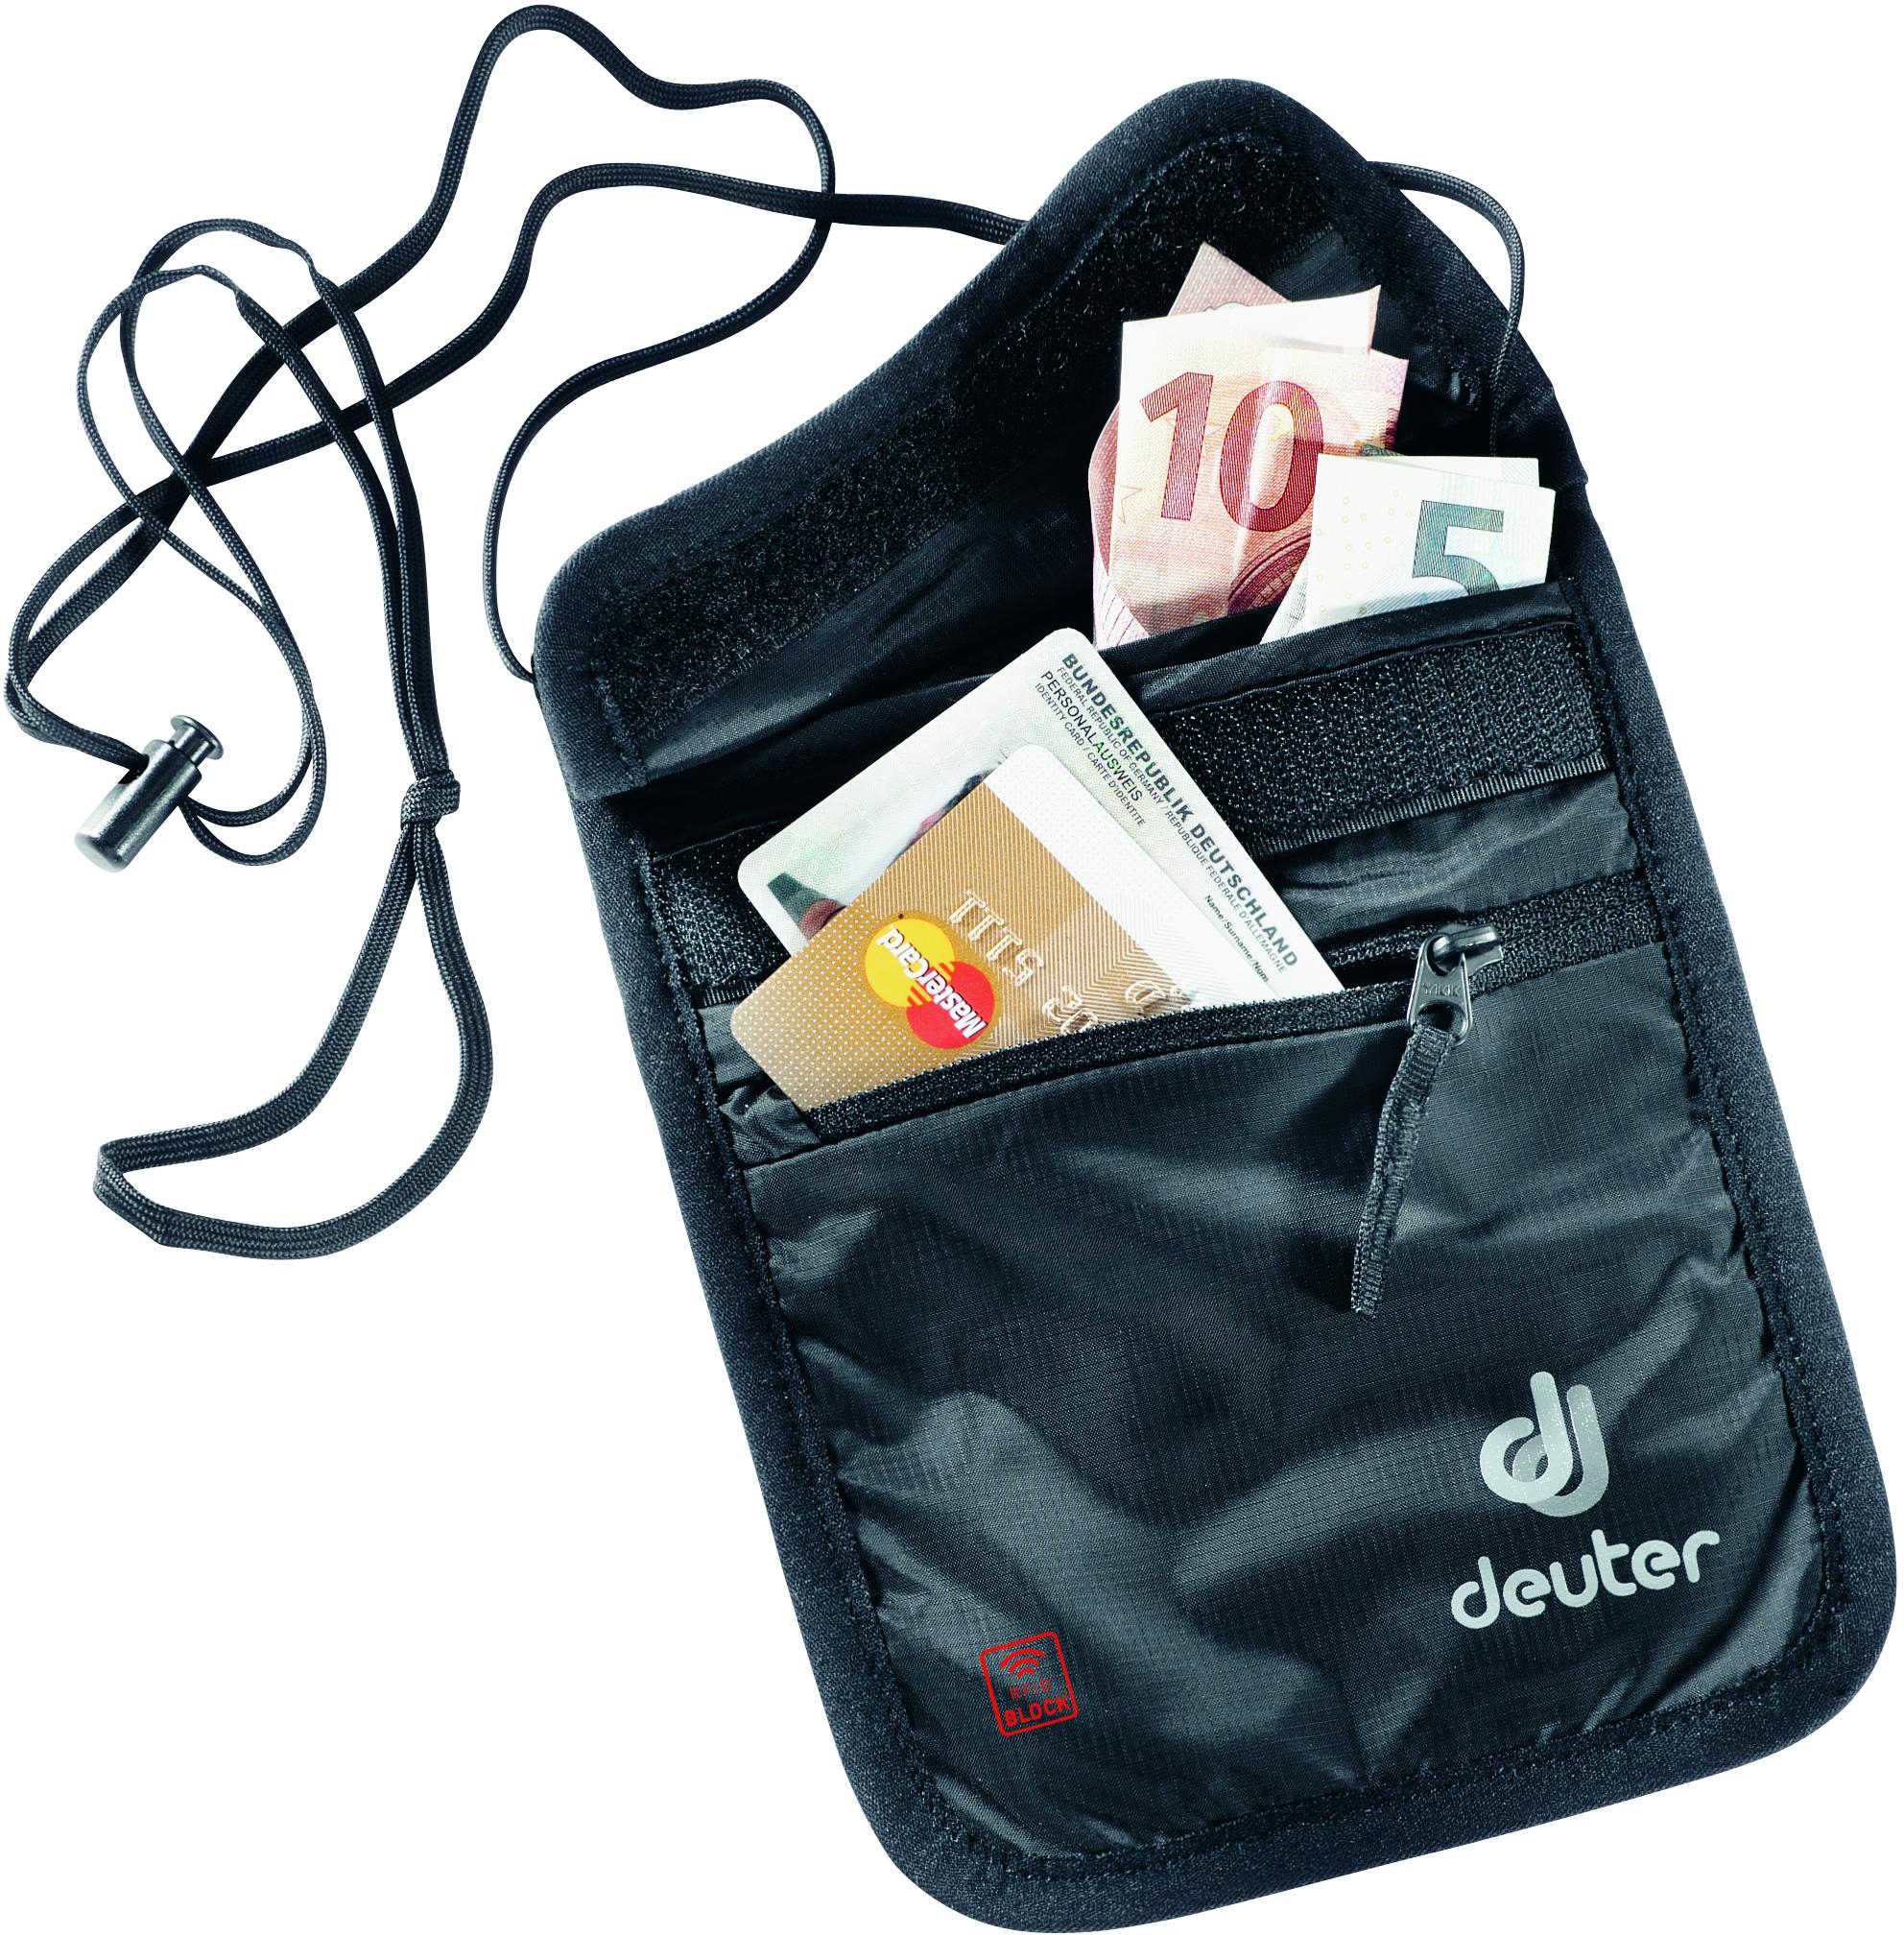 Кошельки Кошелек на шею Deuter Security Wallet II RFID BLOCK (2020) 3cf53c381863aaa30fdba223b58b29fa.jpg